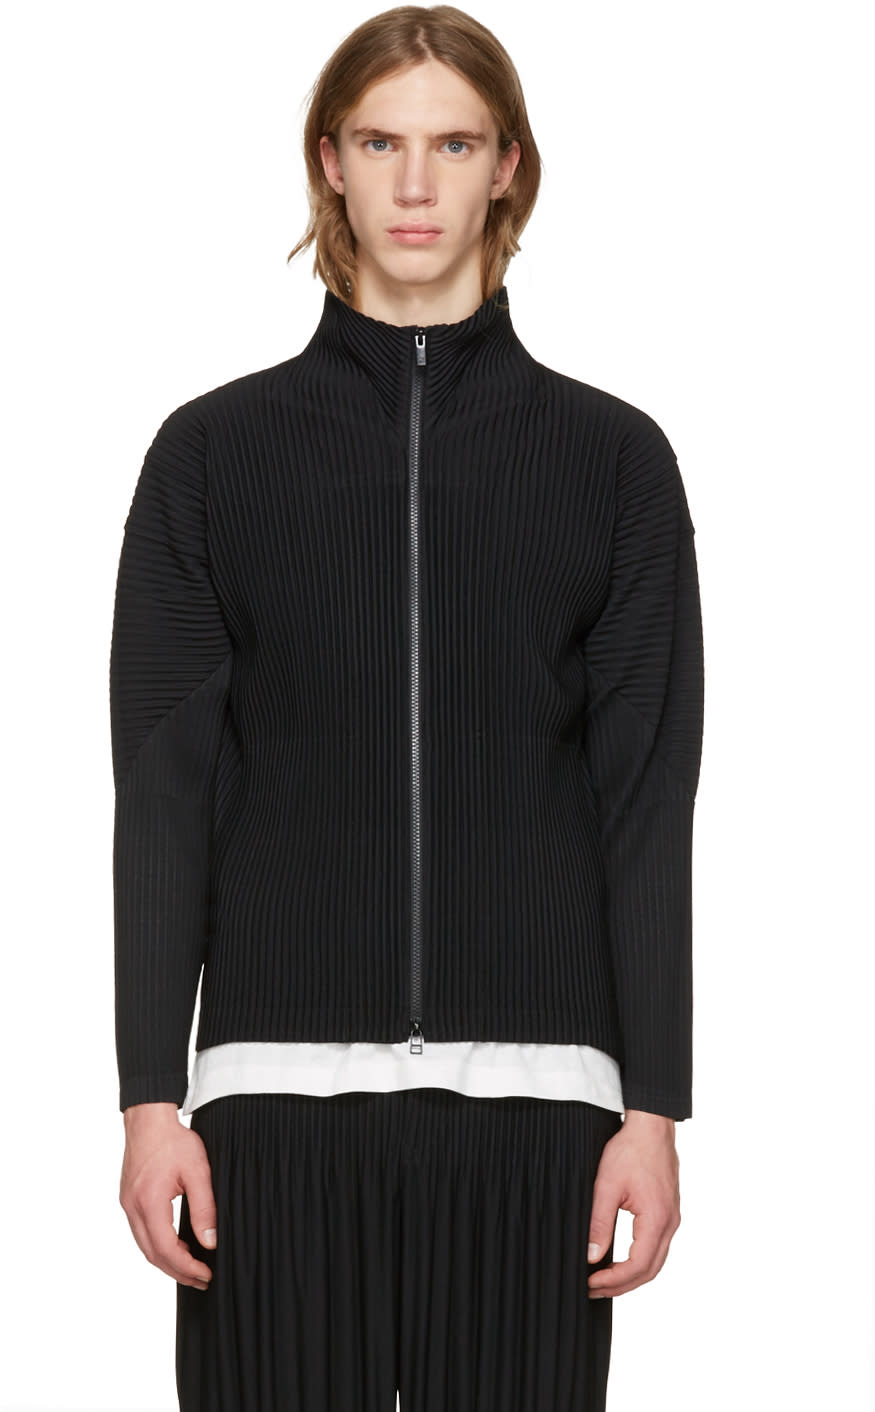 Homme Plisse Issey Miyake Black Classic Pleats Track Jacket